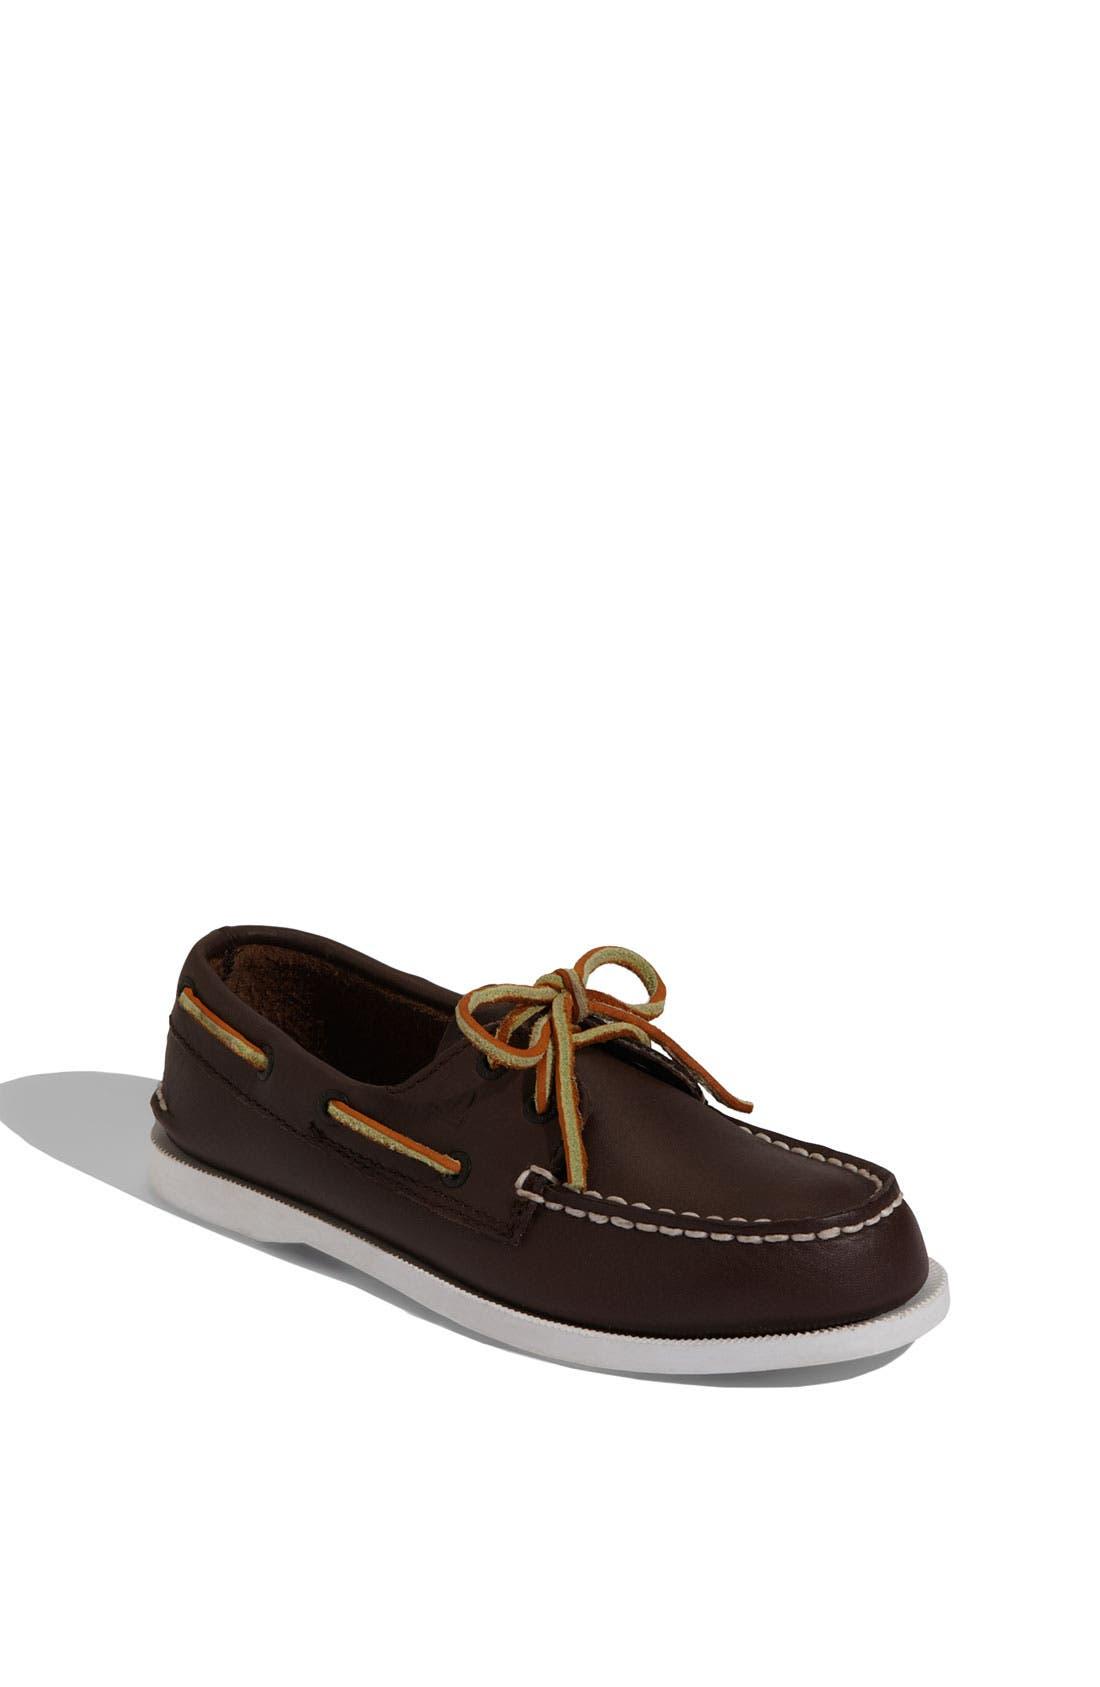 'Authentic Original' Boat Shoe,                             Main thumbnail 1, color,                             Brown Leather